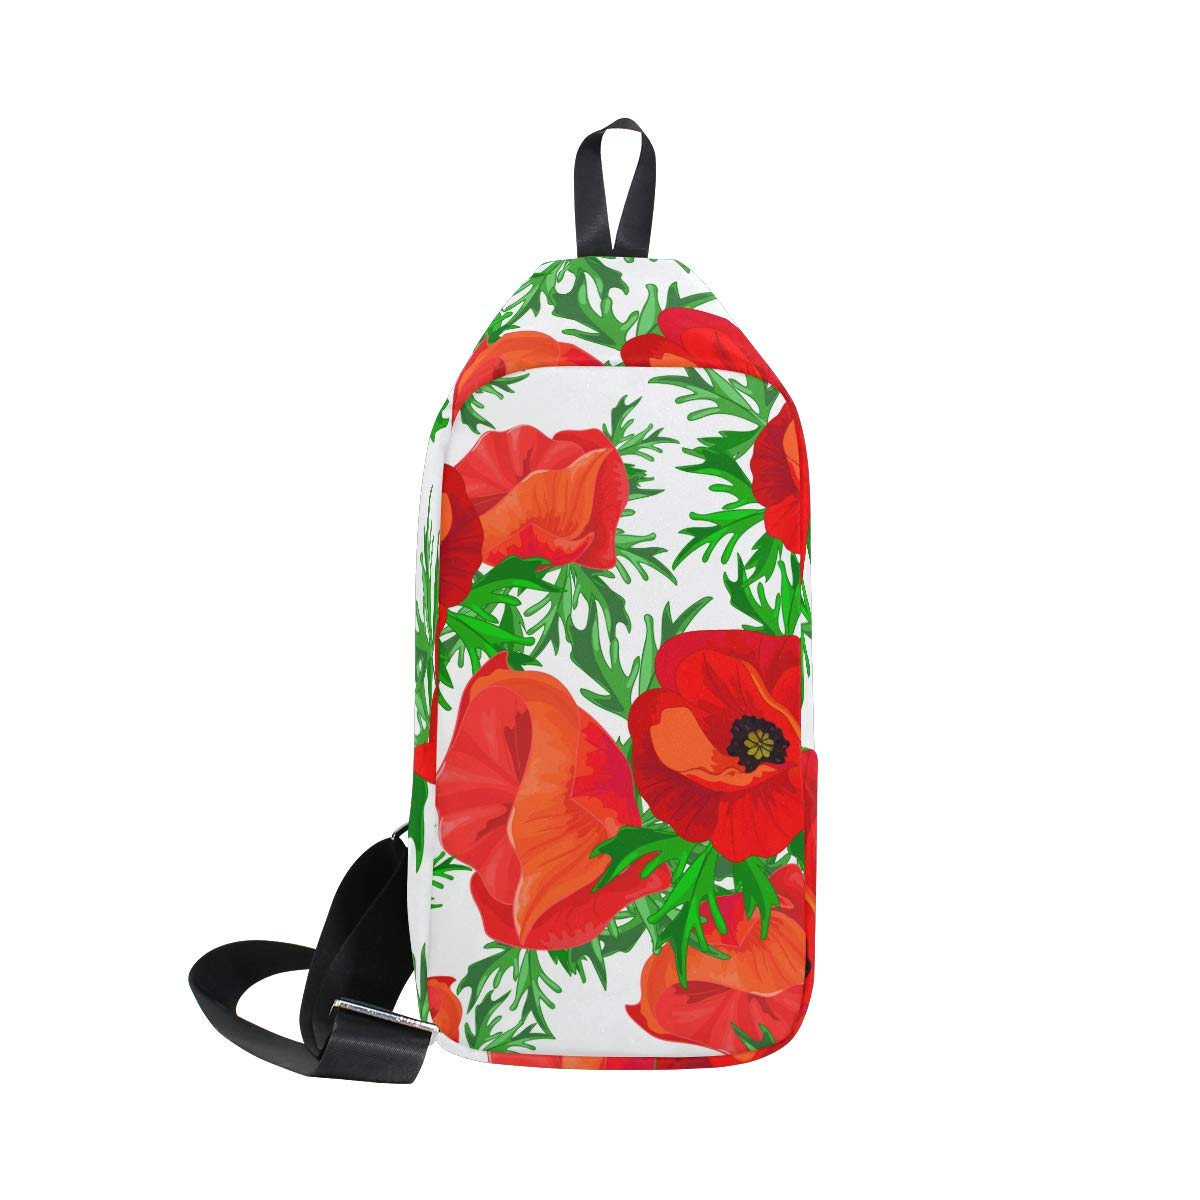 TFONE Red Poppy Flower Crossbody Bag Lightweight Chest Shoulder Messenger Pack Backpack Sling Bag